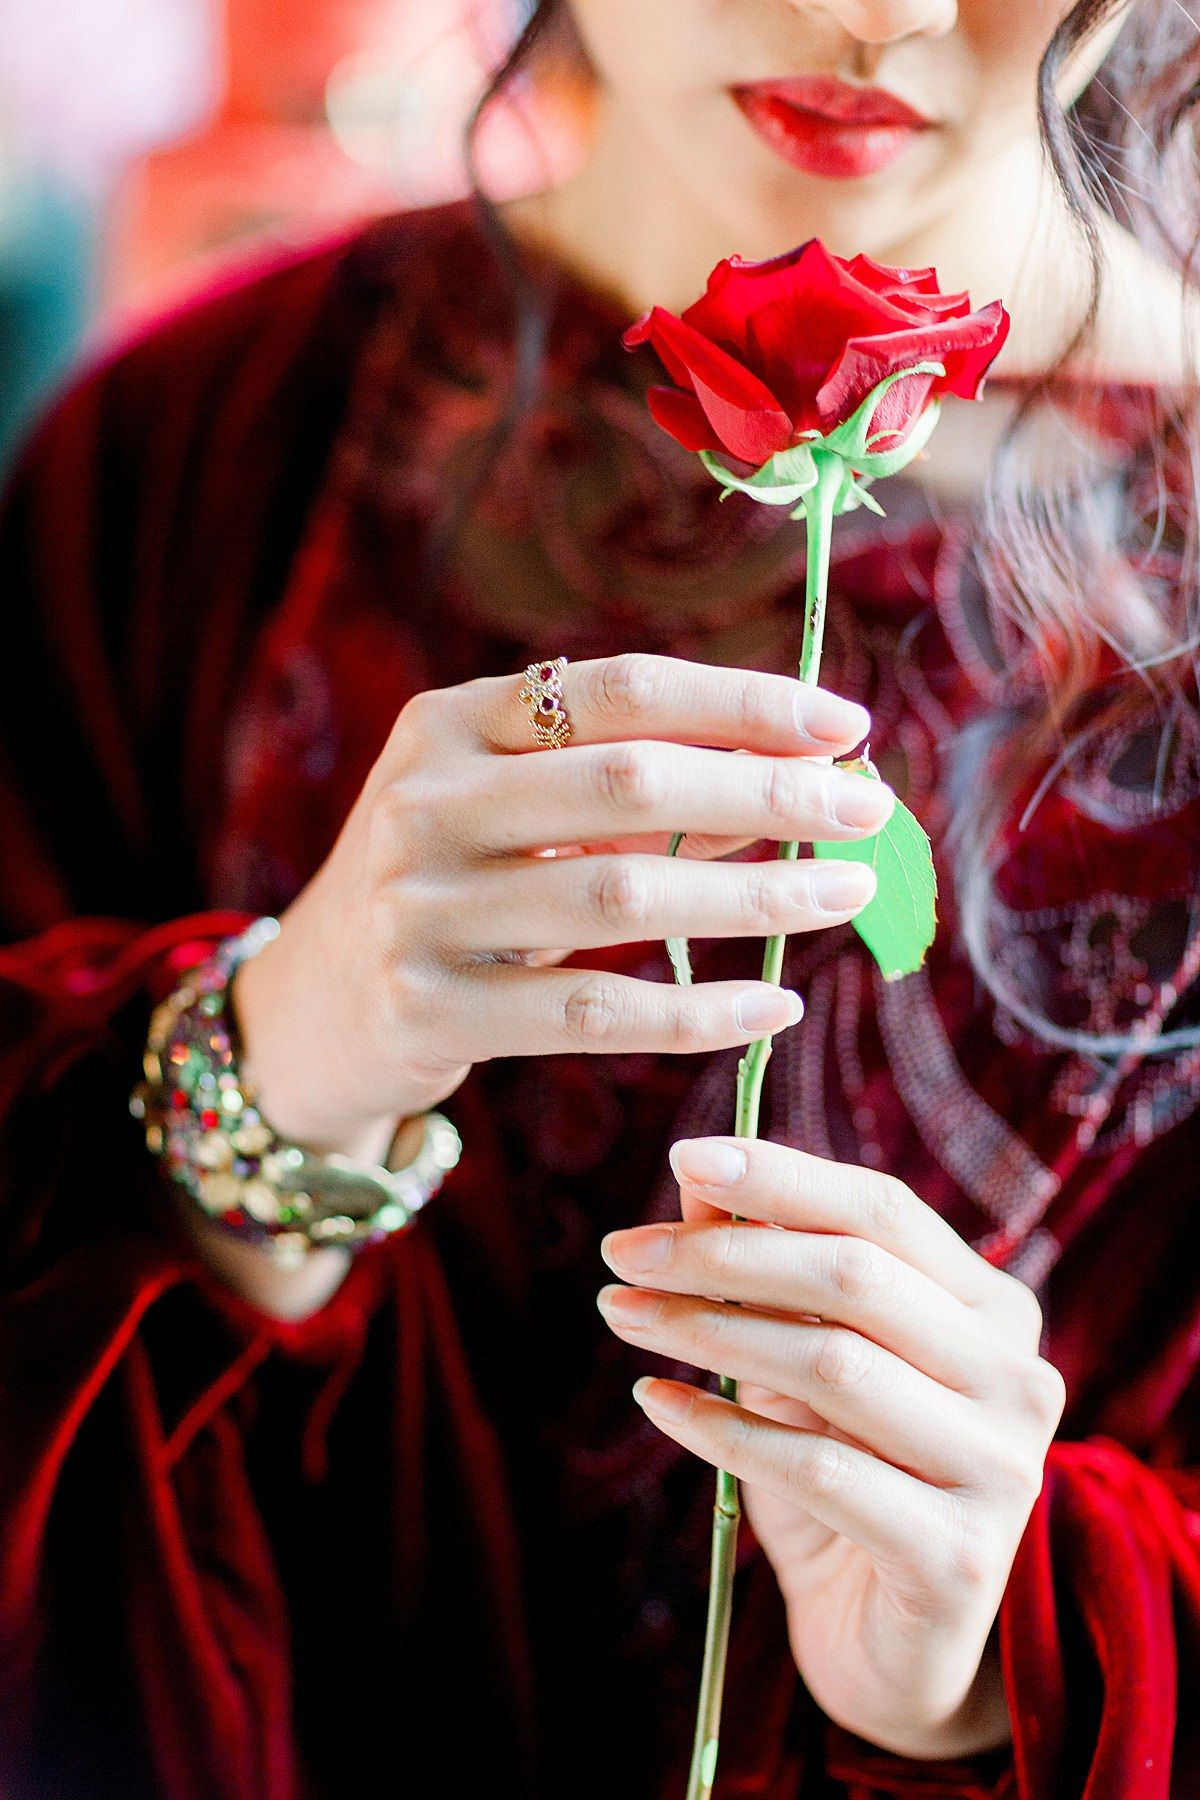 Briar Rose Pre Raphaelite Inspired Shoot with Joanne Fleming Design dresses, Jo Bradbury Photography, London Victorian Ring Company, HF Couture jewelled cuff #joanneflemingdesign #jobradburyphotography #legendofbriarrose #briarrose #preraphaelitemuse #redvelvetdress #preraphaelitedress #rubyengagementring #jewelledcuff